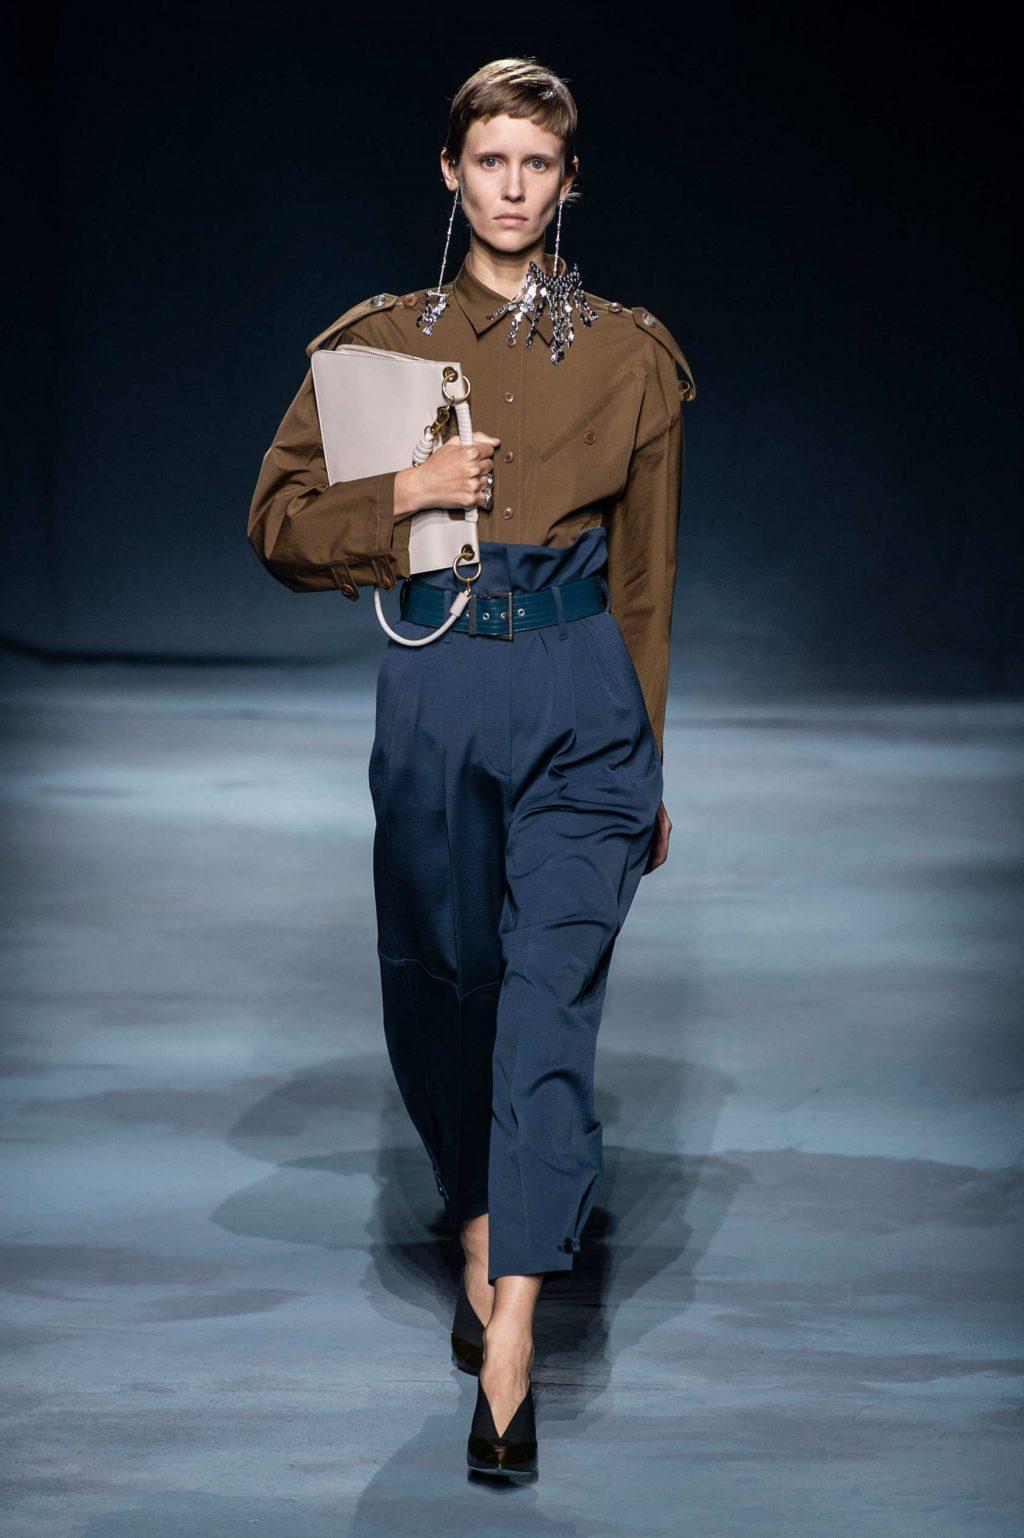 Tuần lễ thời trang Paris 2019 Givenchy